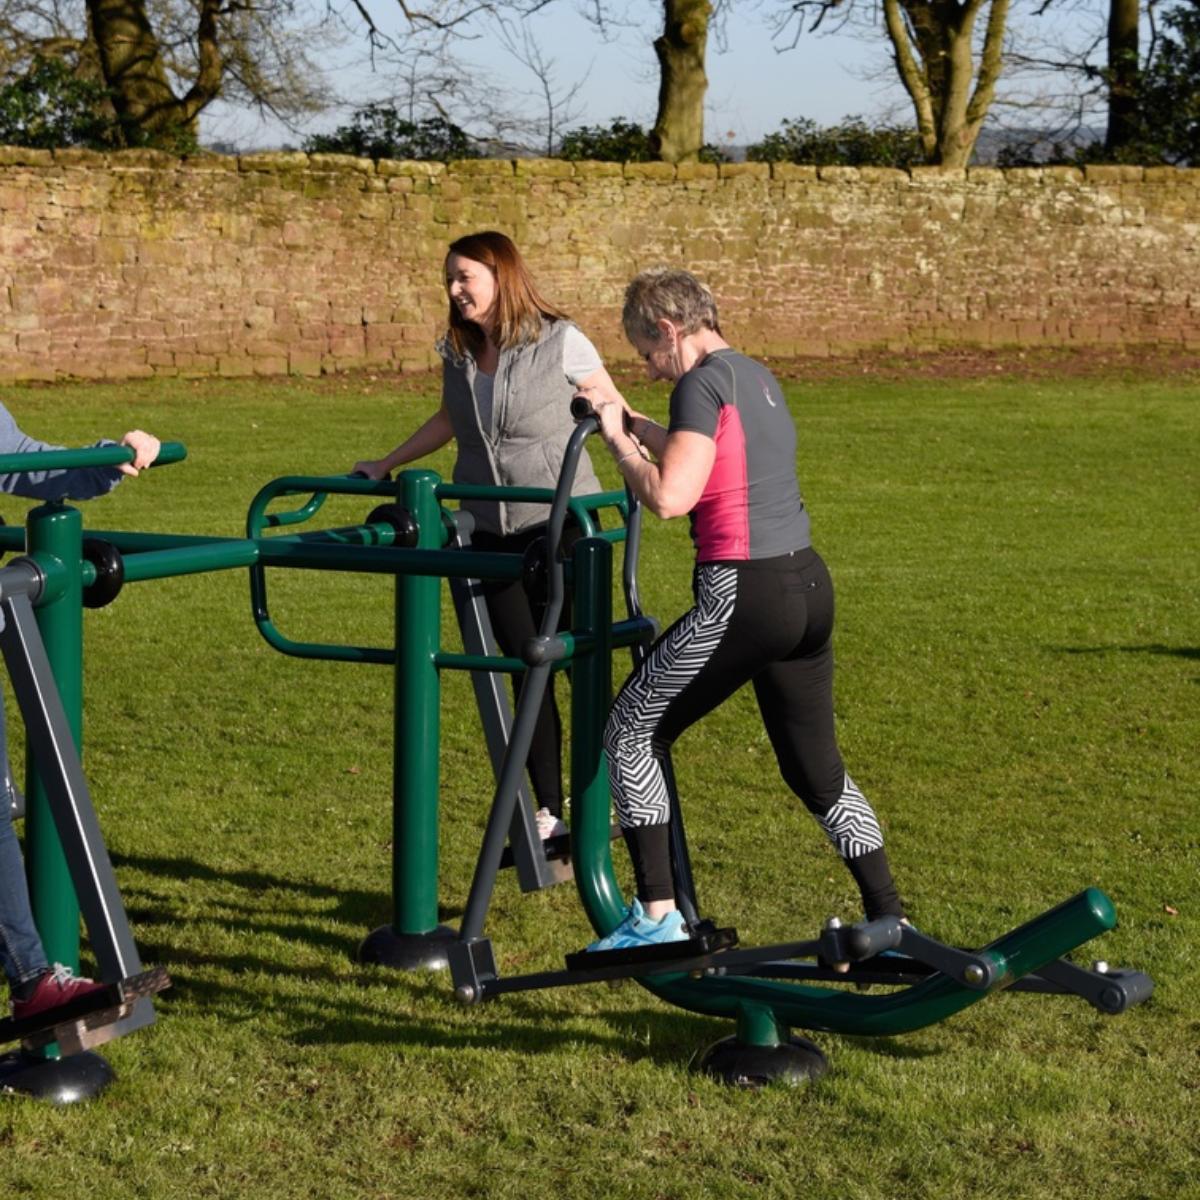 Motiv8 Multi Gym   Outdoor Gym Equipment   Sunshine Gym